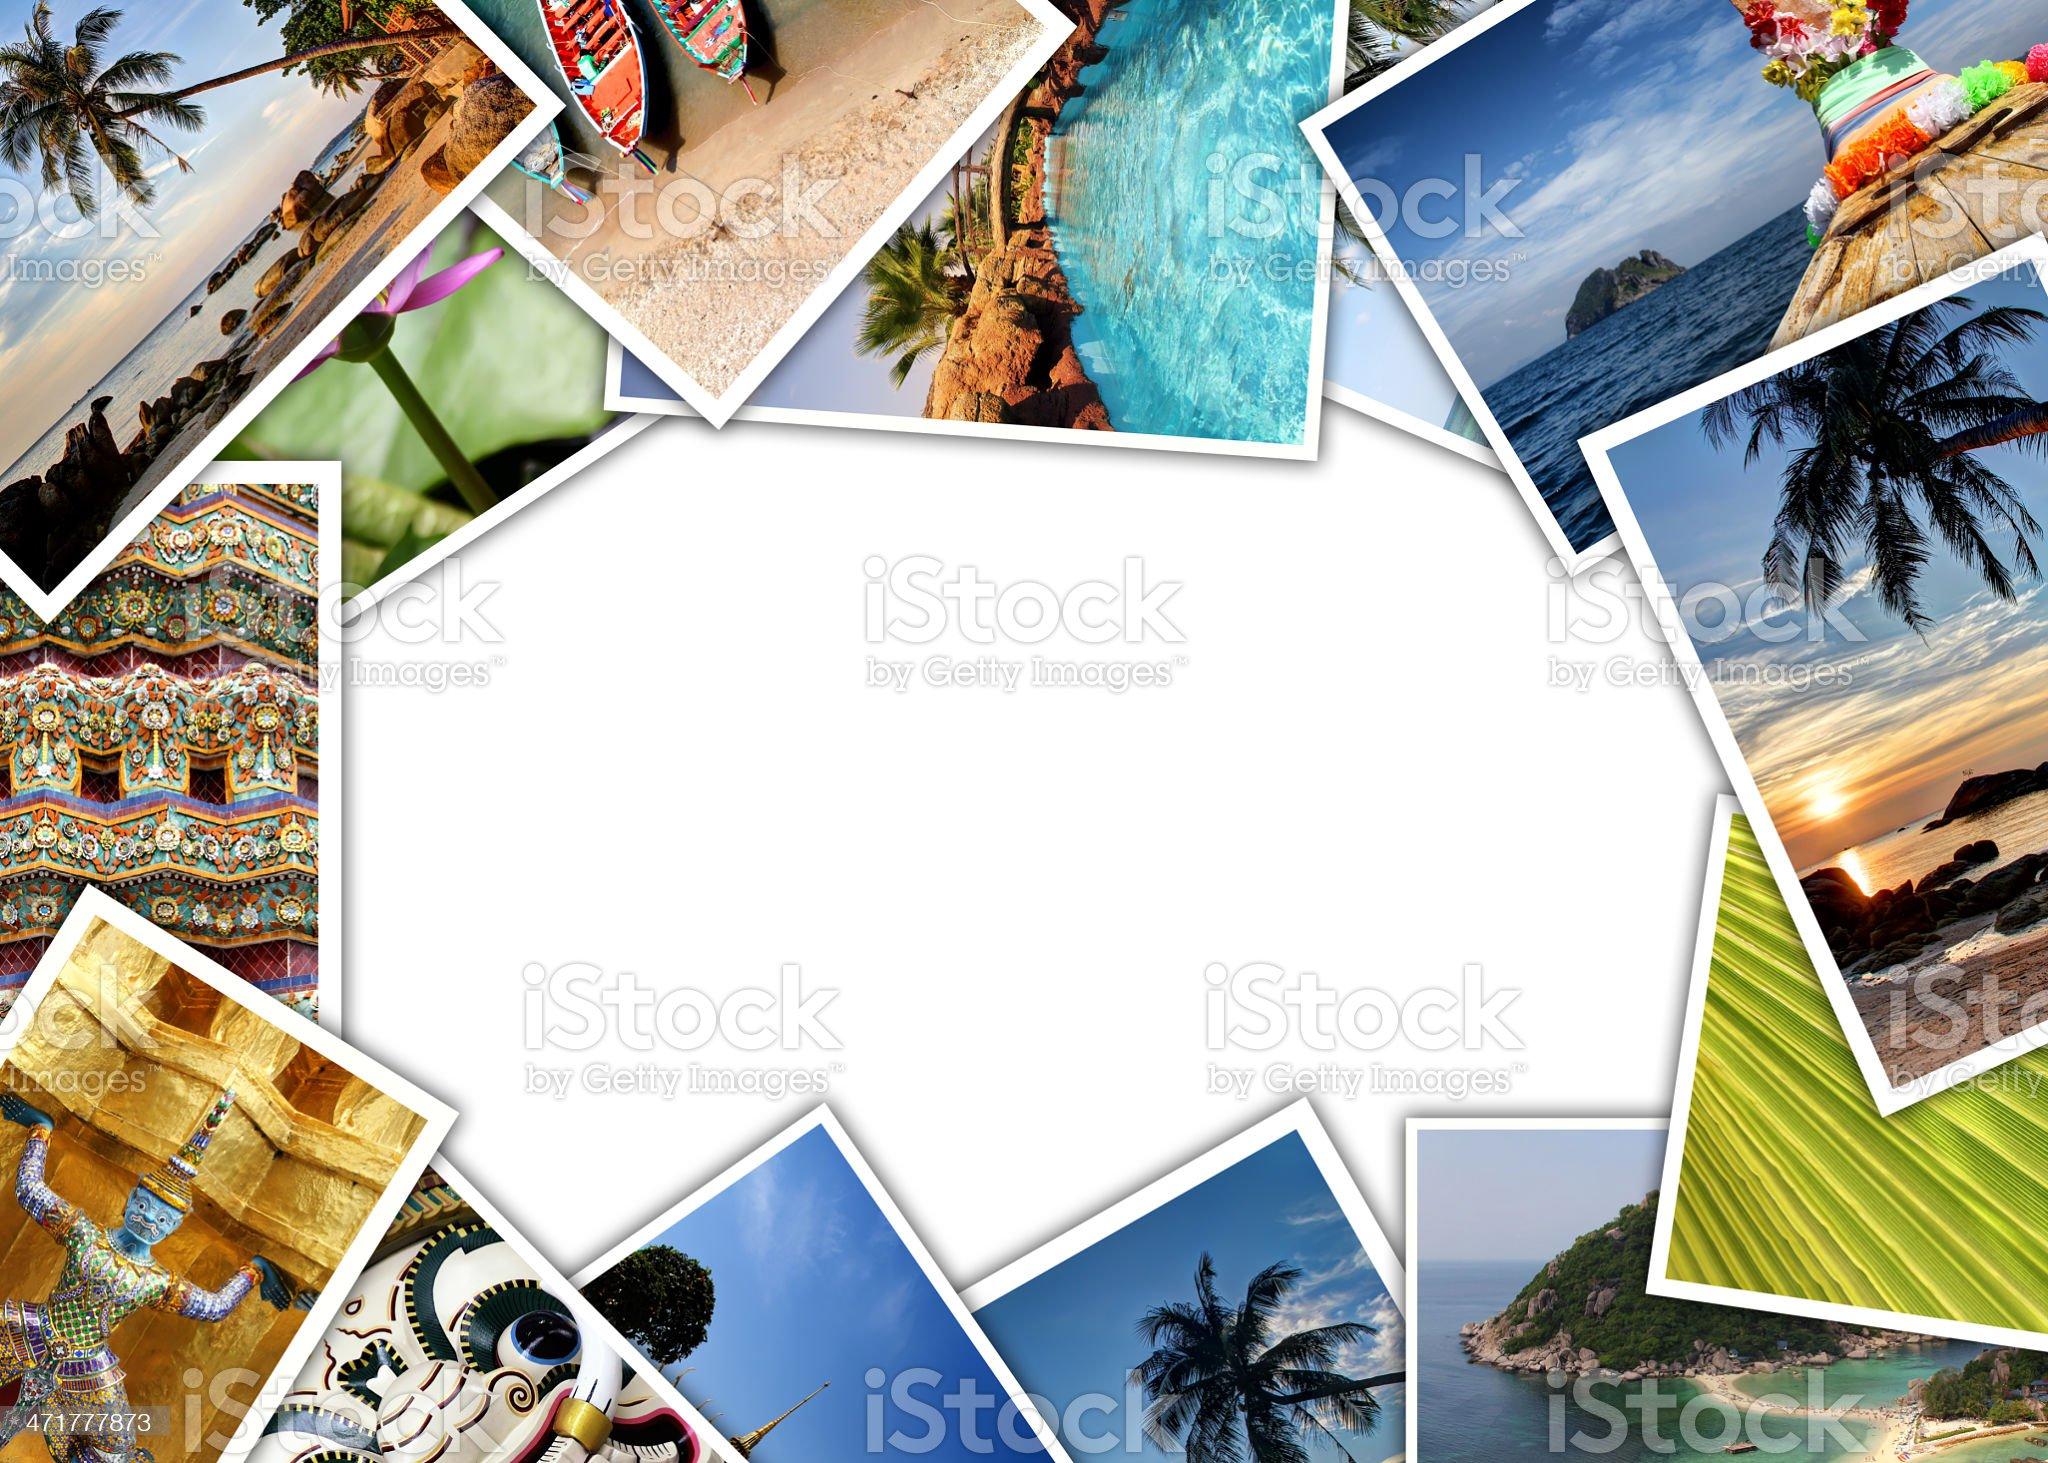 Thailand royalty-free stock photo